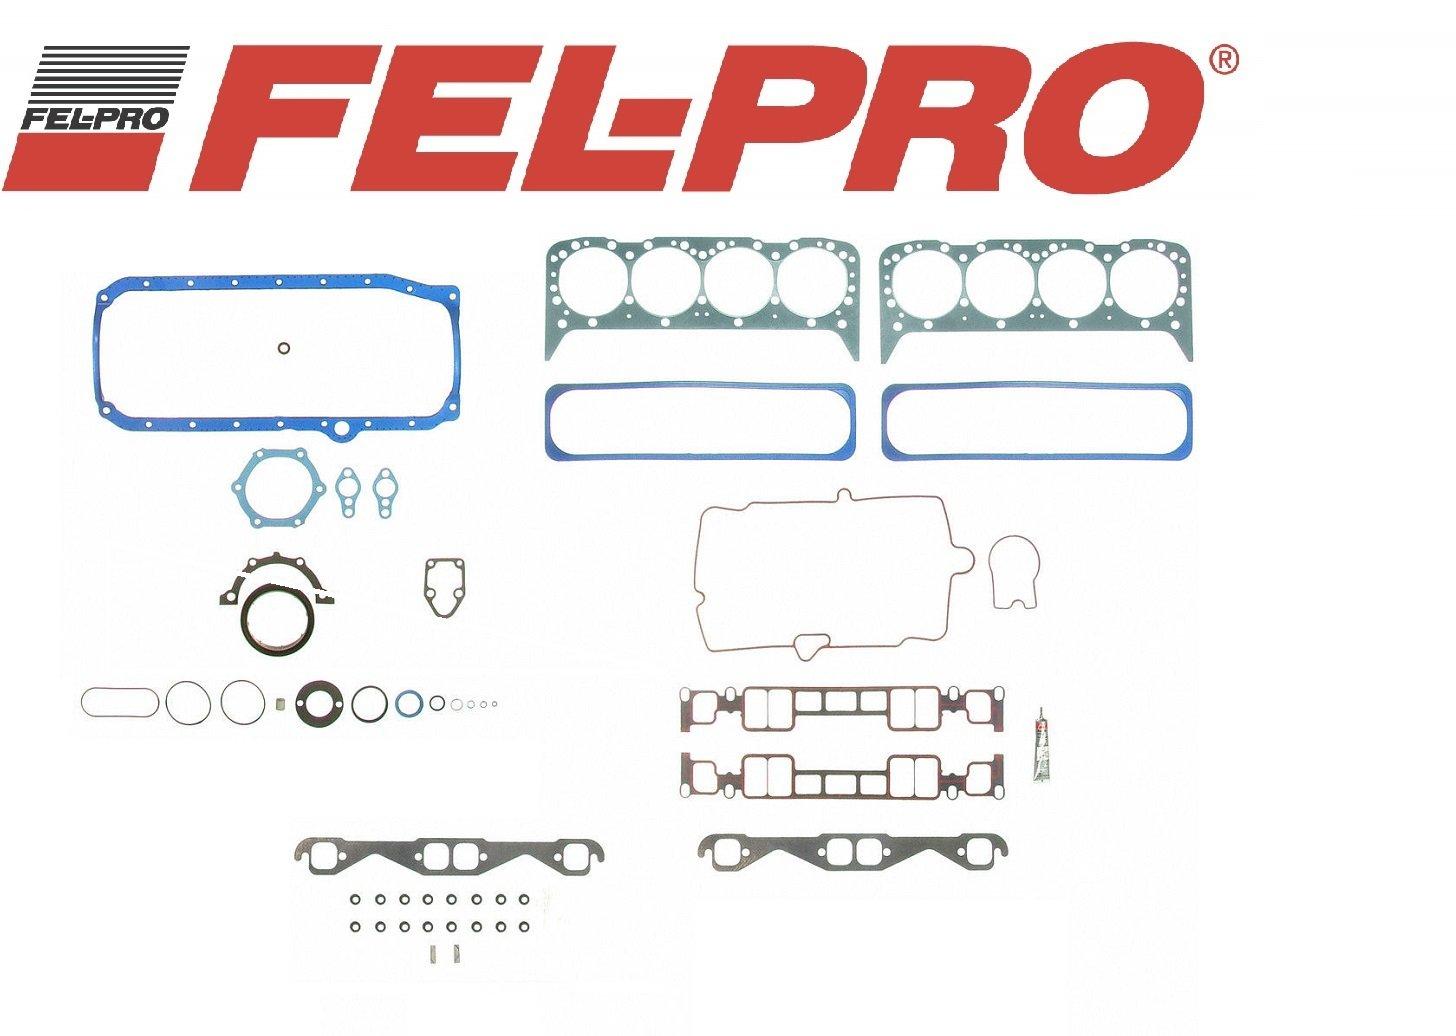 Chevy 350 57 Vortec Fel Pro Full Gasket Set Head Intake Engine Diagram Oil Pan Exhaust Bolts 96 02 Vin R Automotive